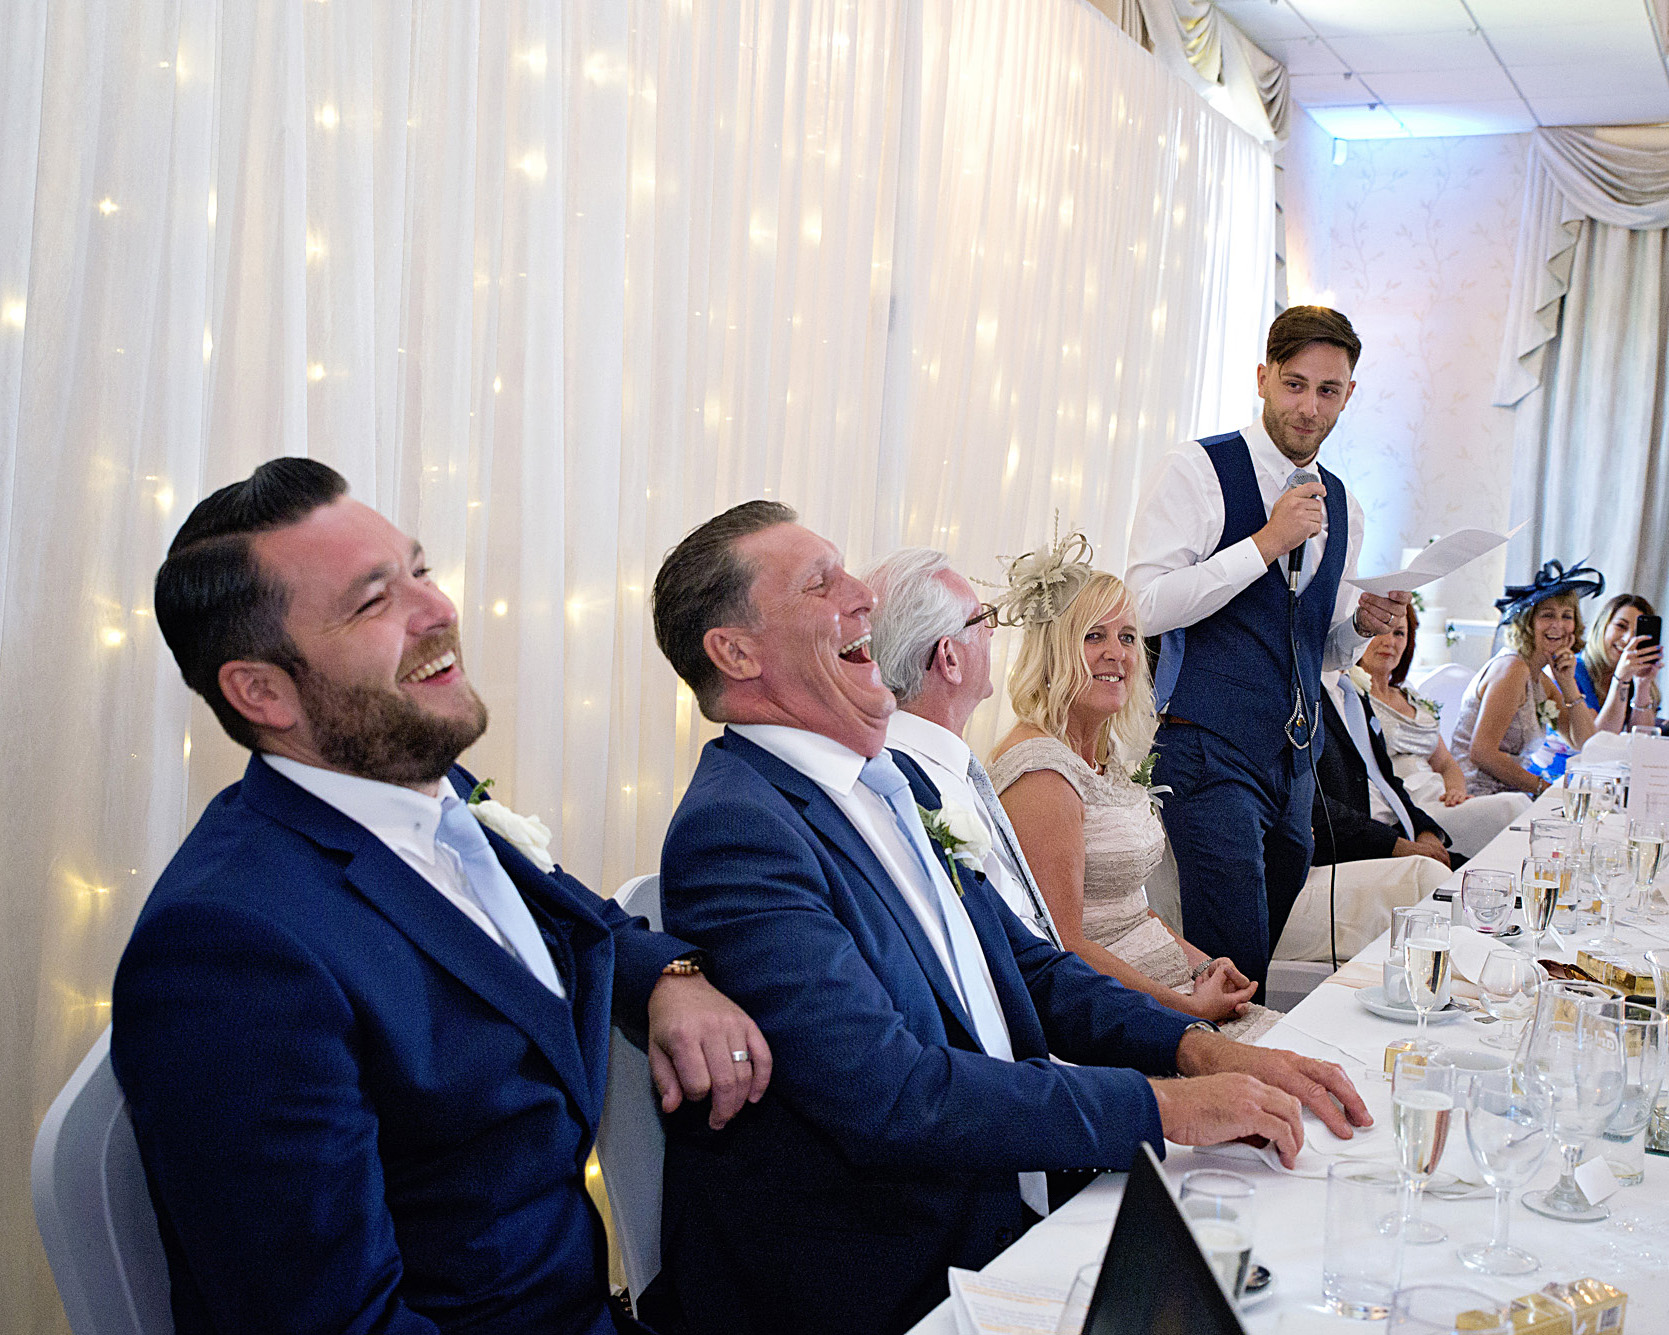 wedding-barnsdale-hall (31).jpg